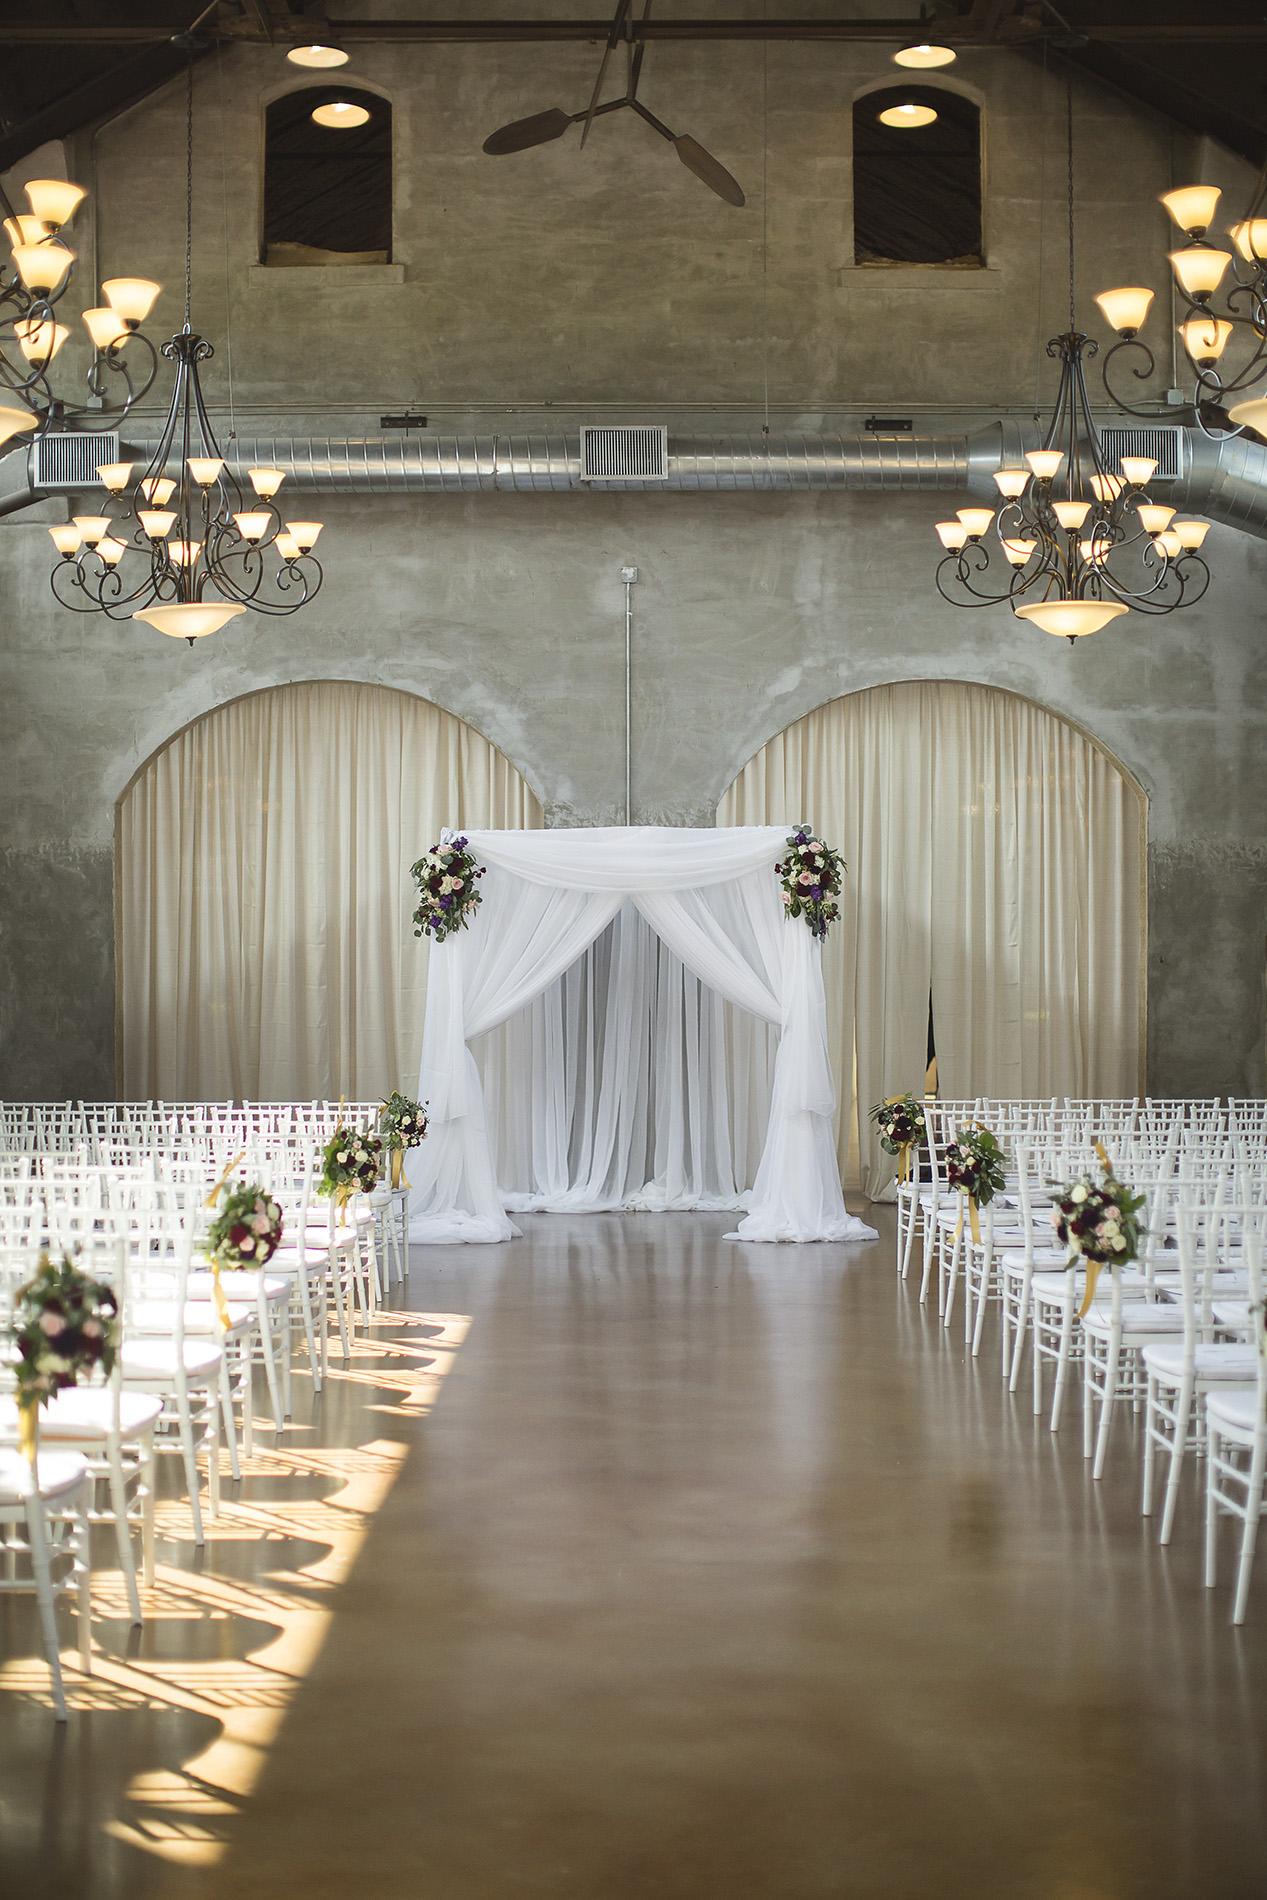 Houston-venue-Olde-Dobbin-Station-Romantic-Classic-Wedding-Photographer-038.jpg